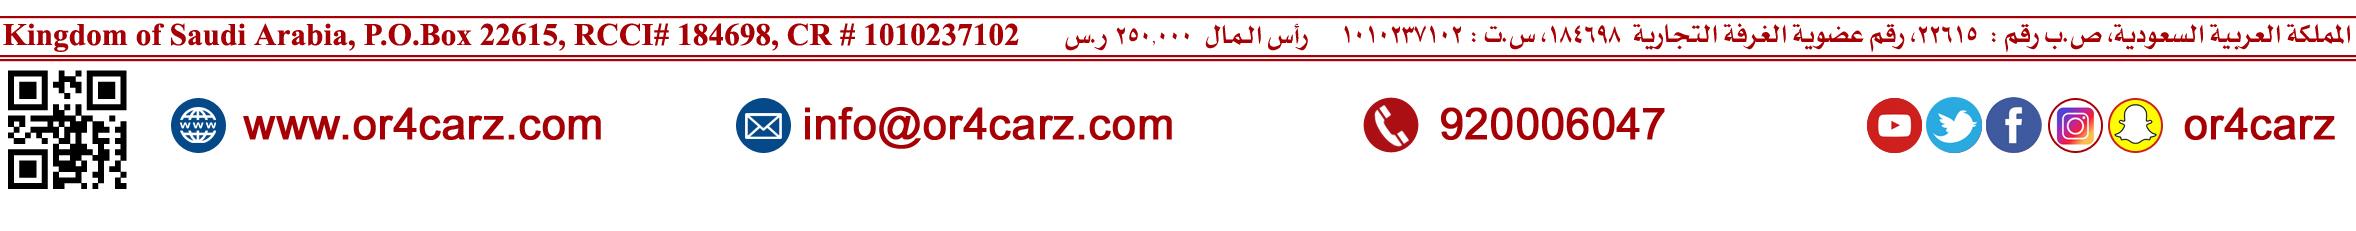 www.or4carz.com